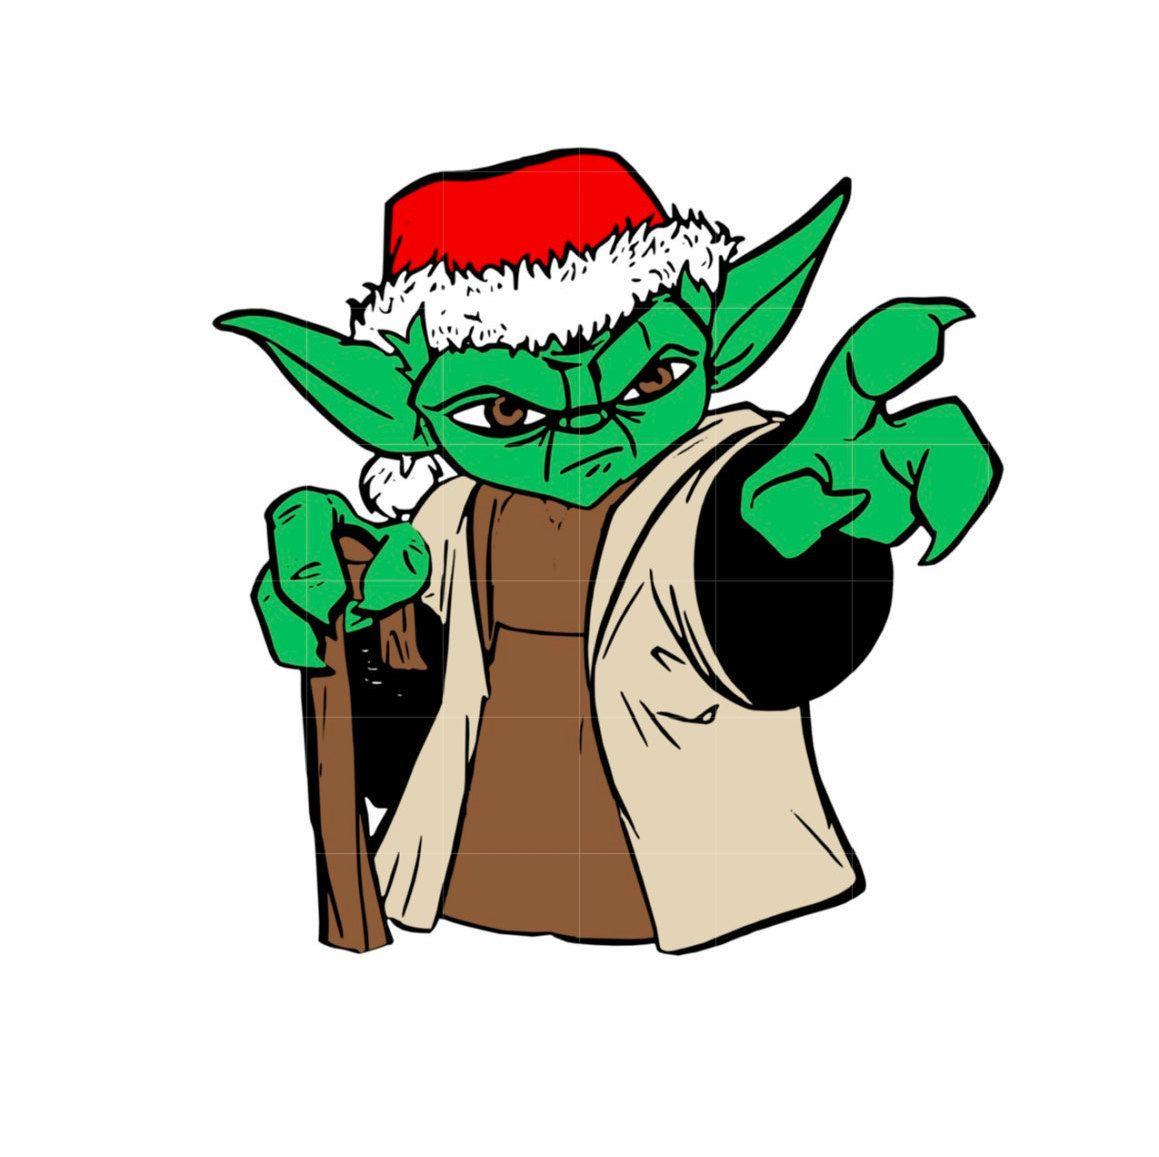 svg studio christmas star wars yoda scalable vector instant download rh pinterest com vector hd free yoda vectoriel